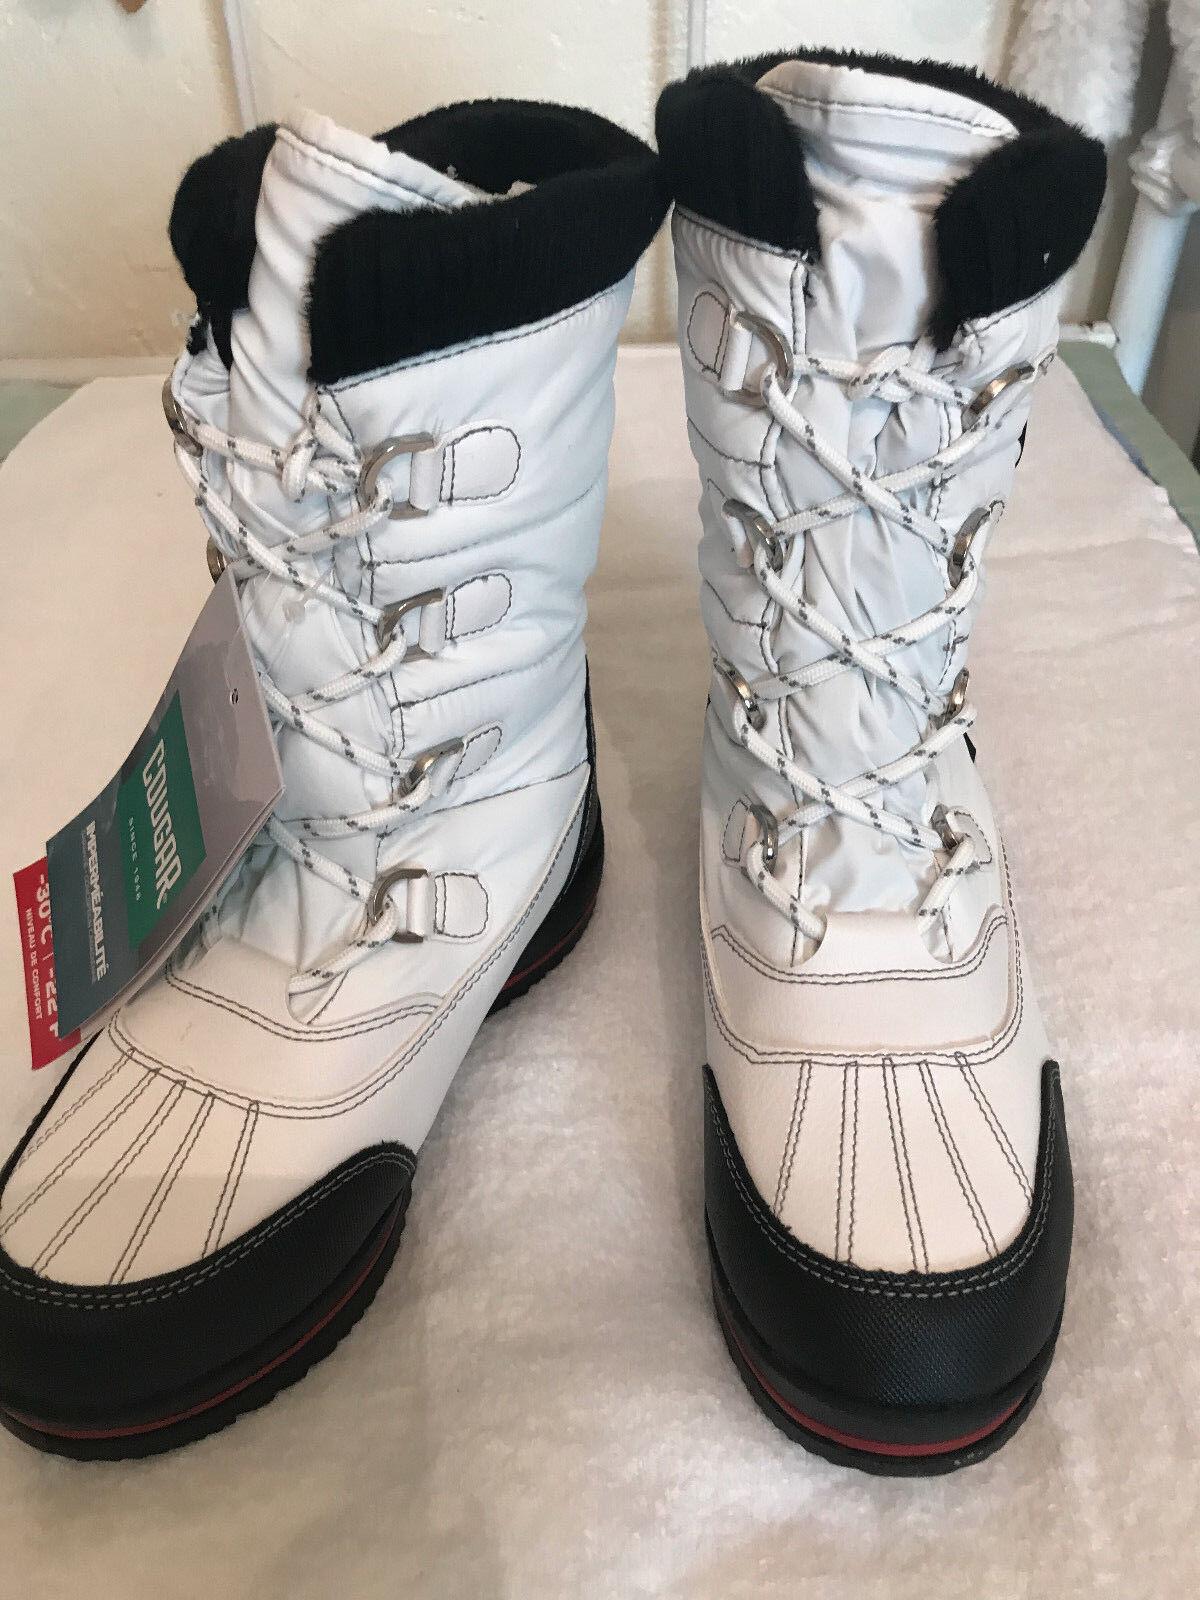 Cougar para mujer botas blancoo Bonair Impermeable, Tamaño 6M, Nuevo Sin Caja